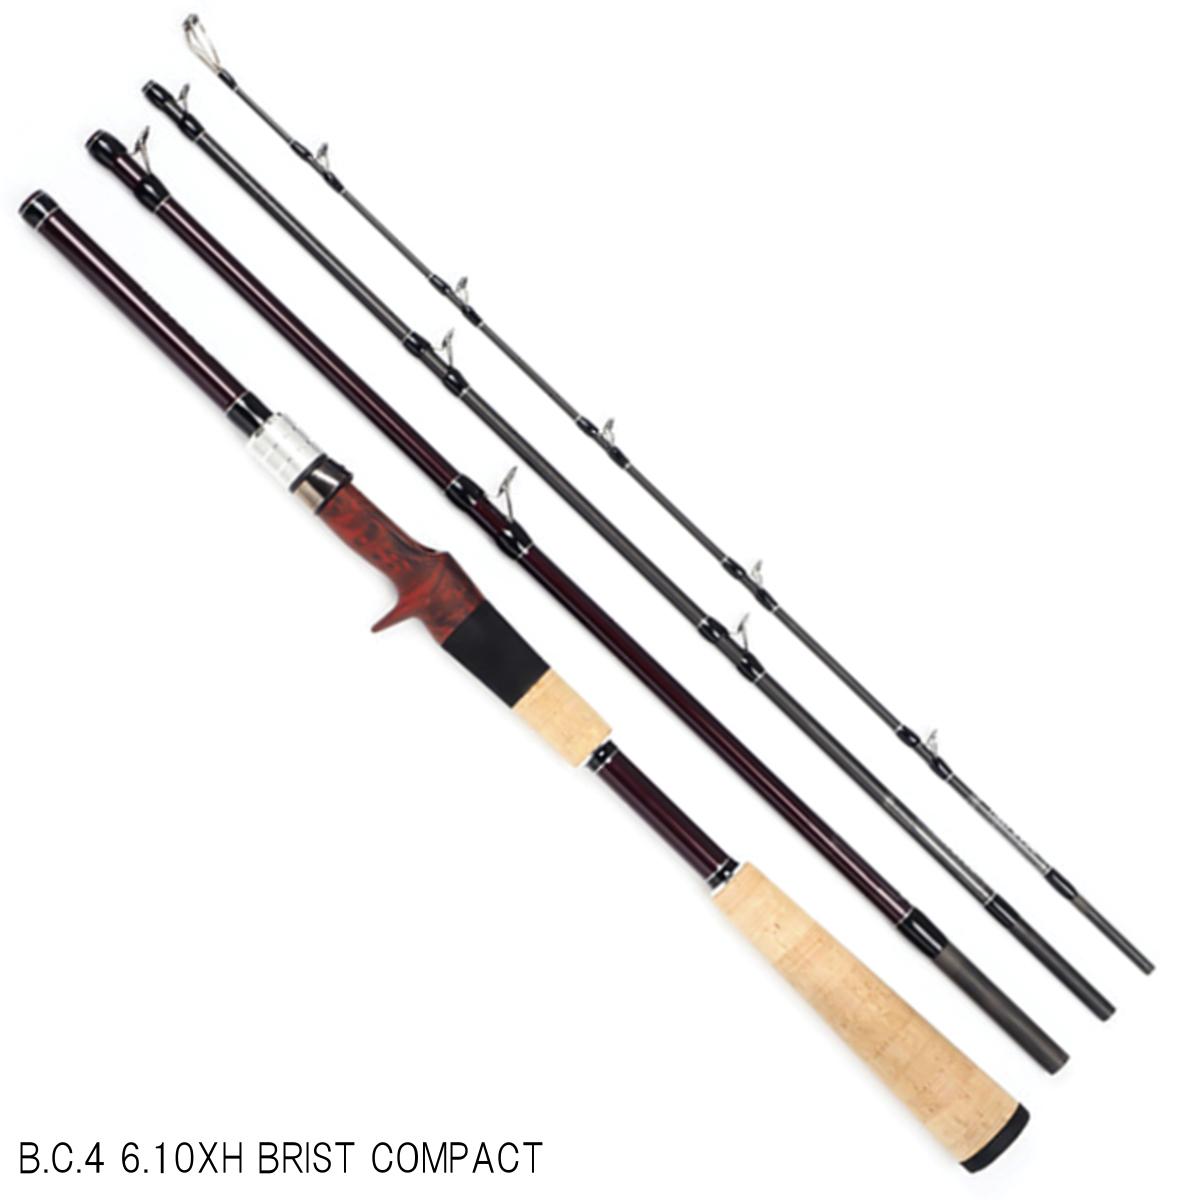 B.C.4 6.10XH BRIST COMPACT